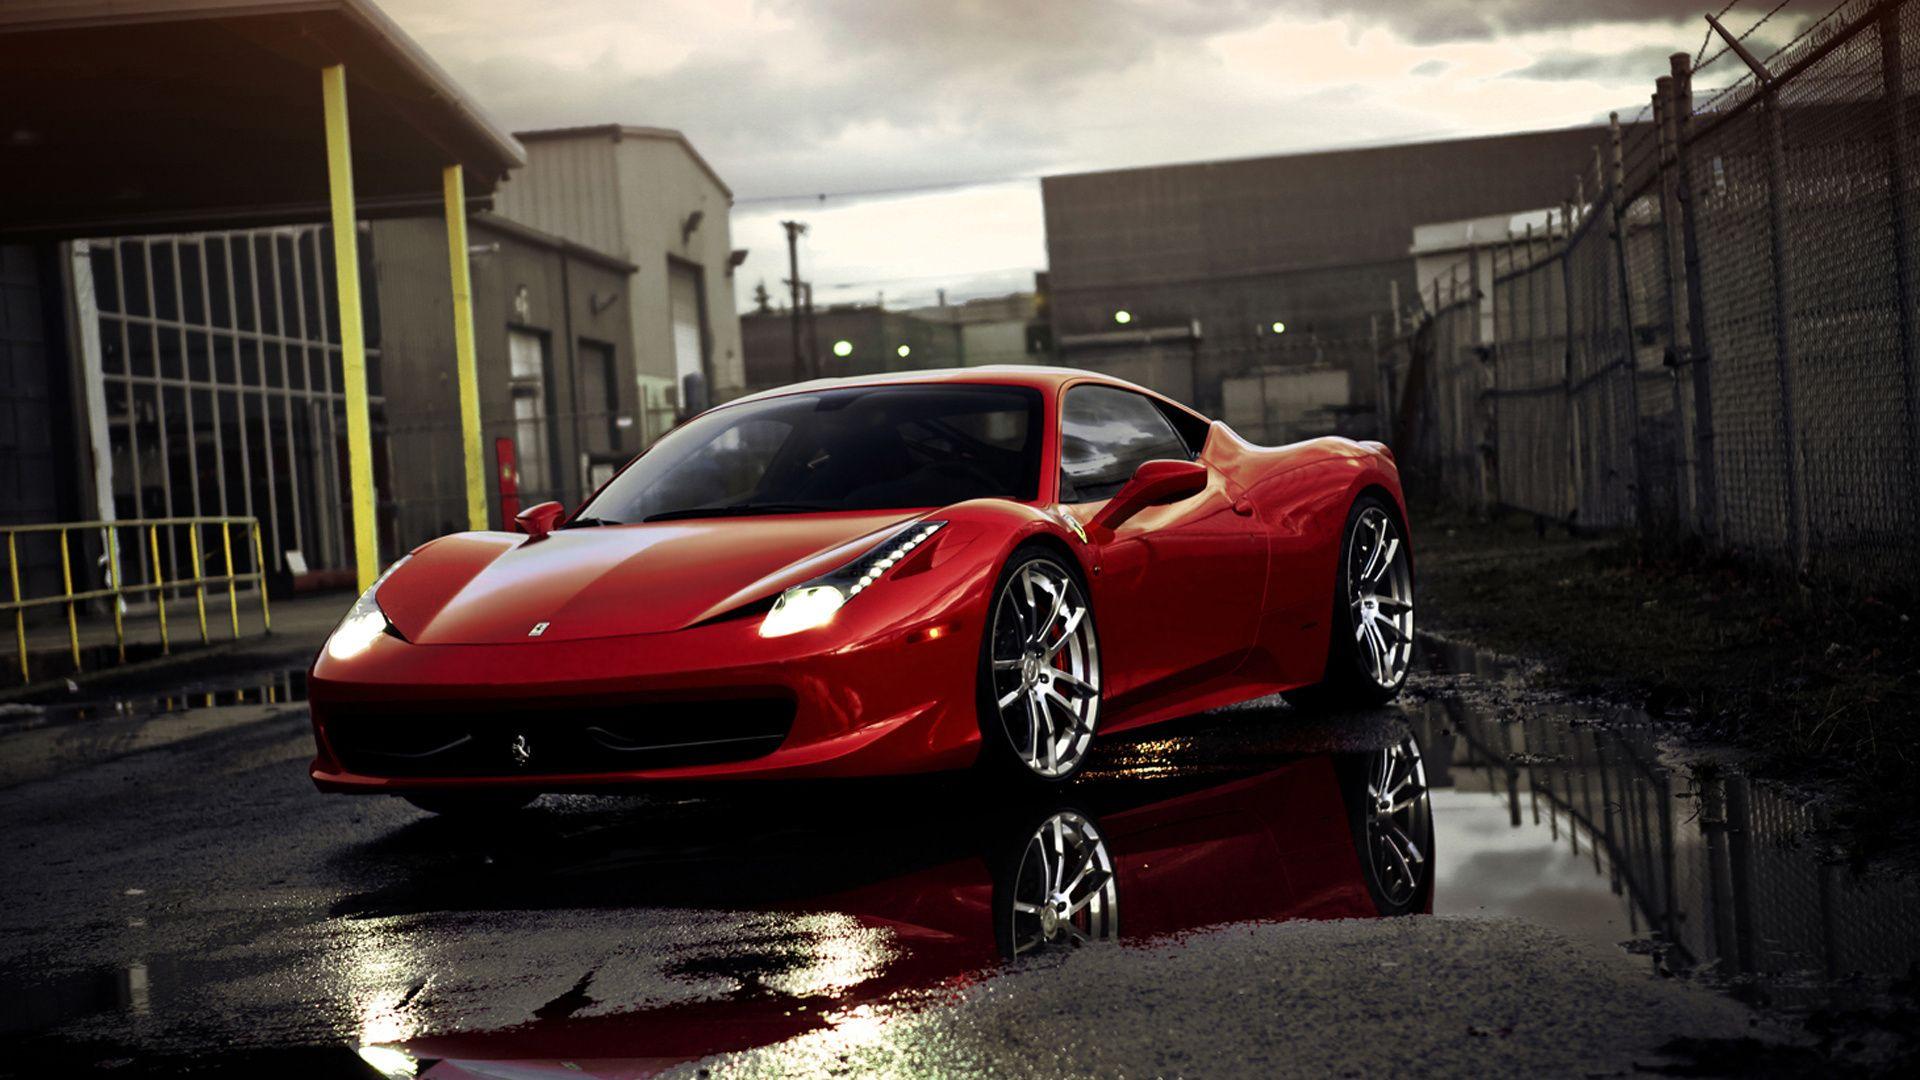 Ferrari 458 ittalia red 1080p hd wallpaper m young pinterest ferrari 458 italia sports cars hd wallpaper hd wallpaper of vanachro Gallery